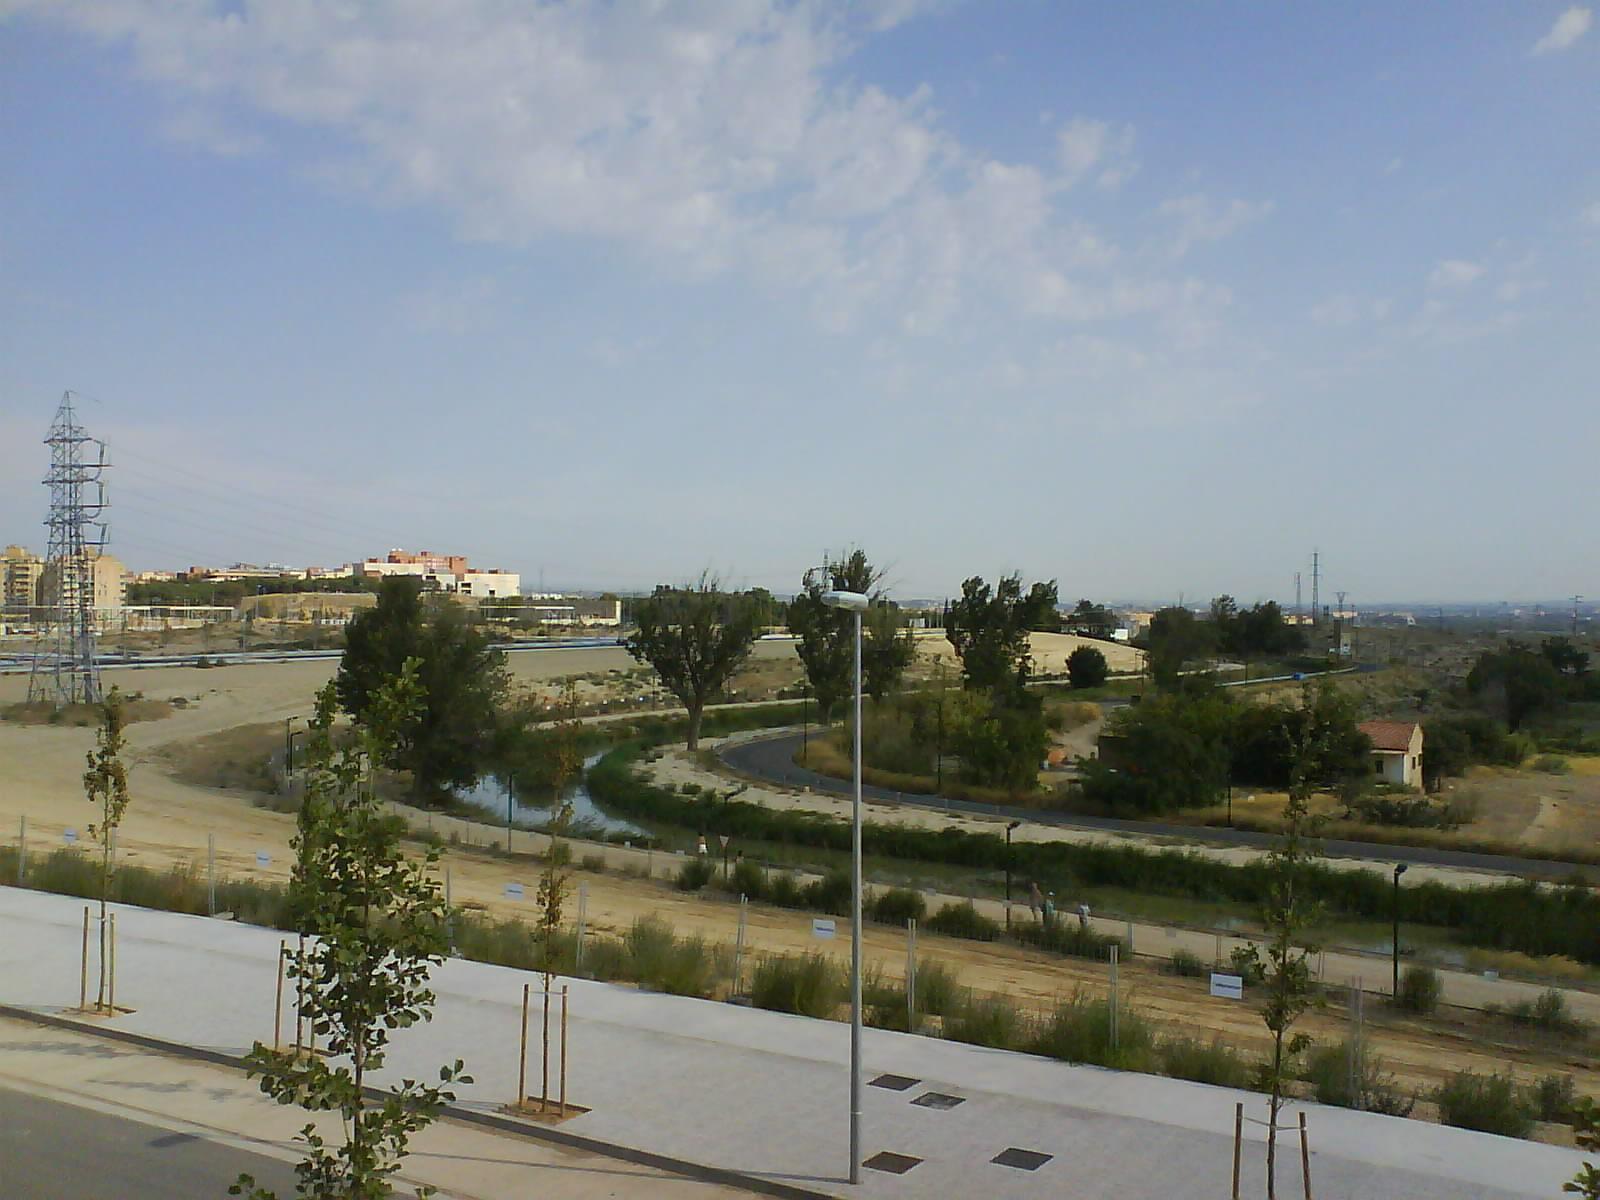 Canal Imerial de Aragón desde Urbanización Parque Venecia Zaragoza